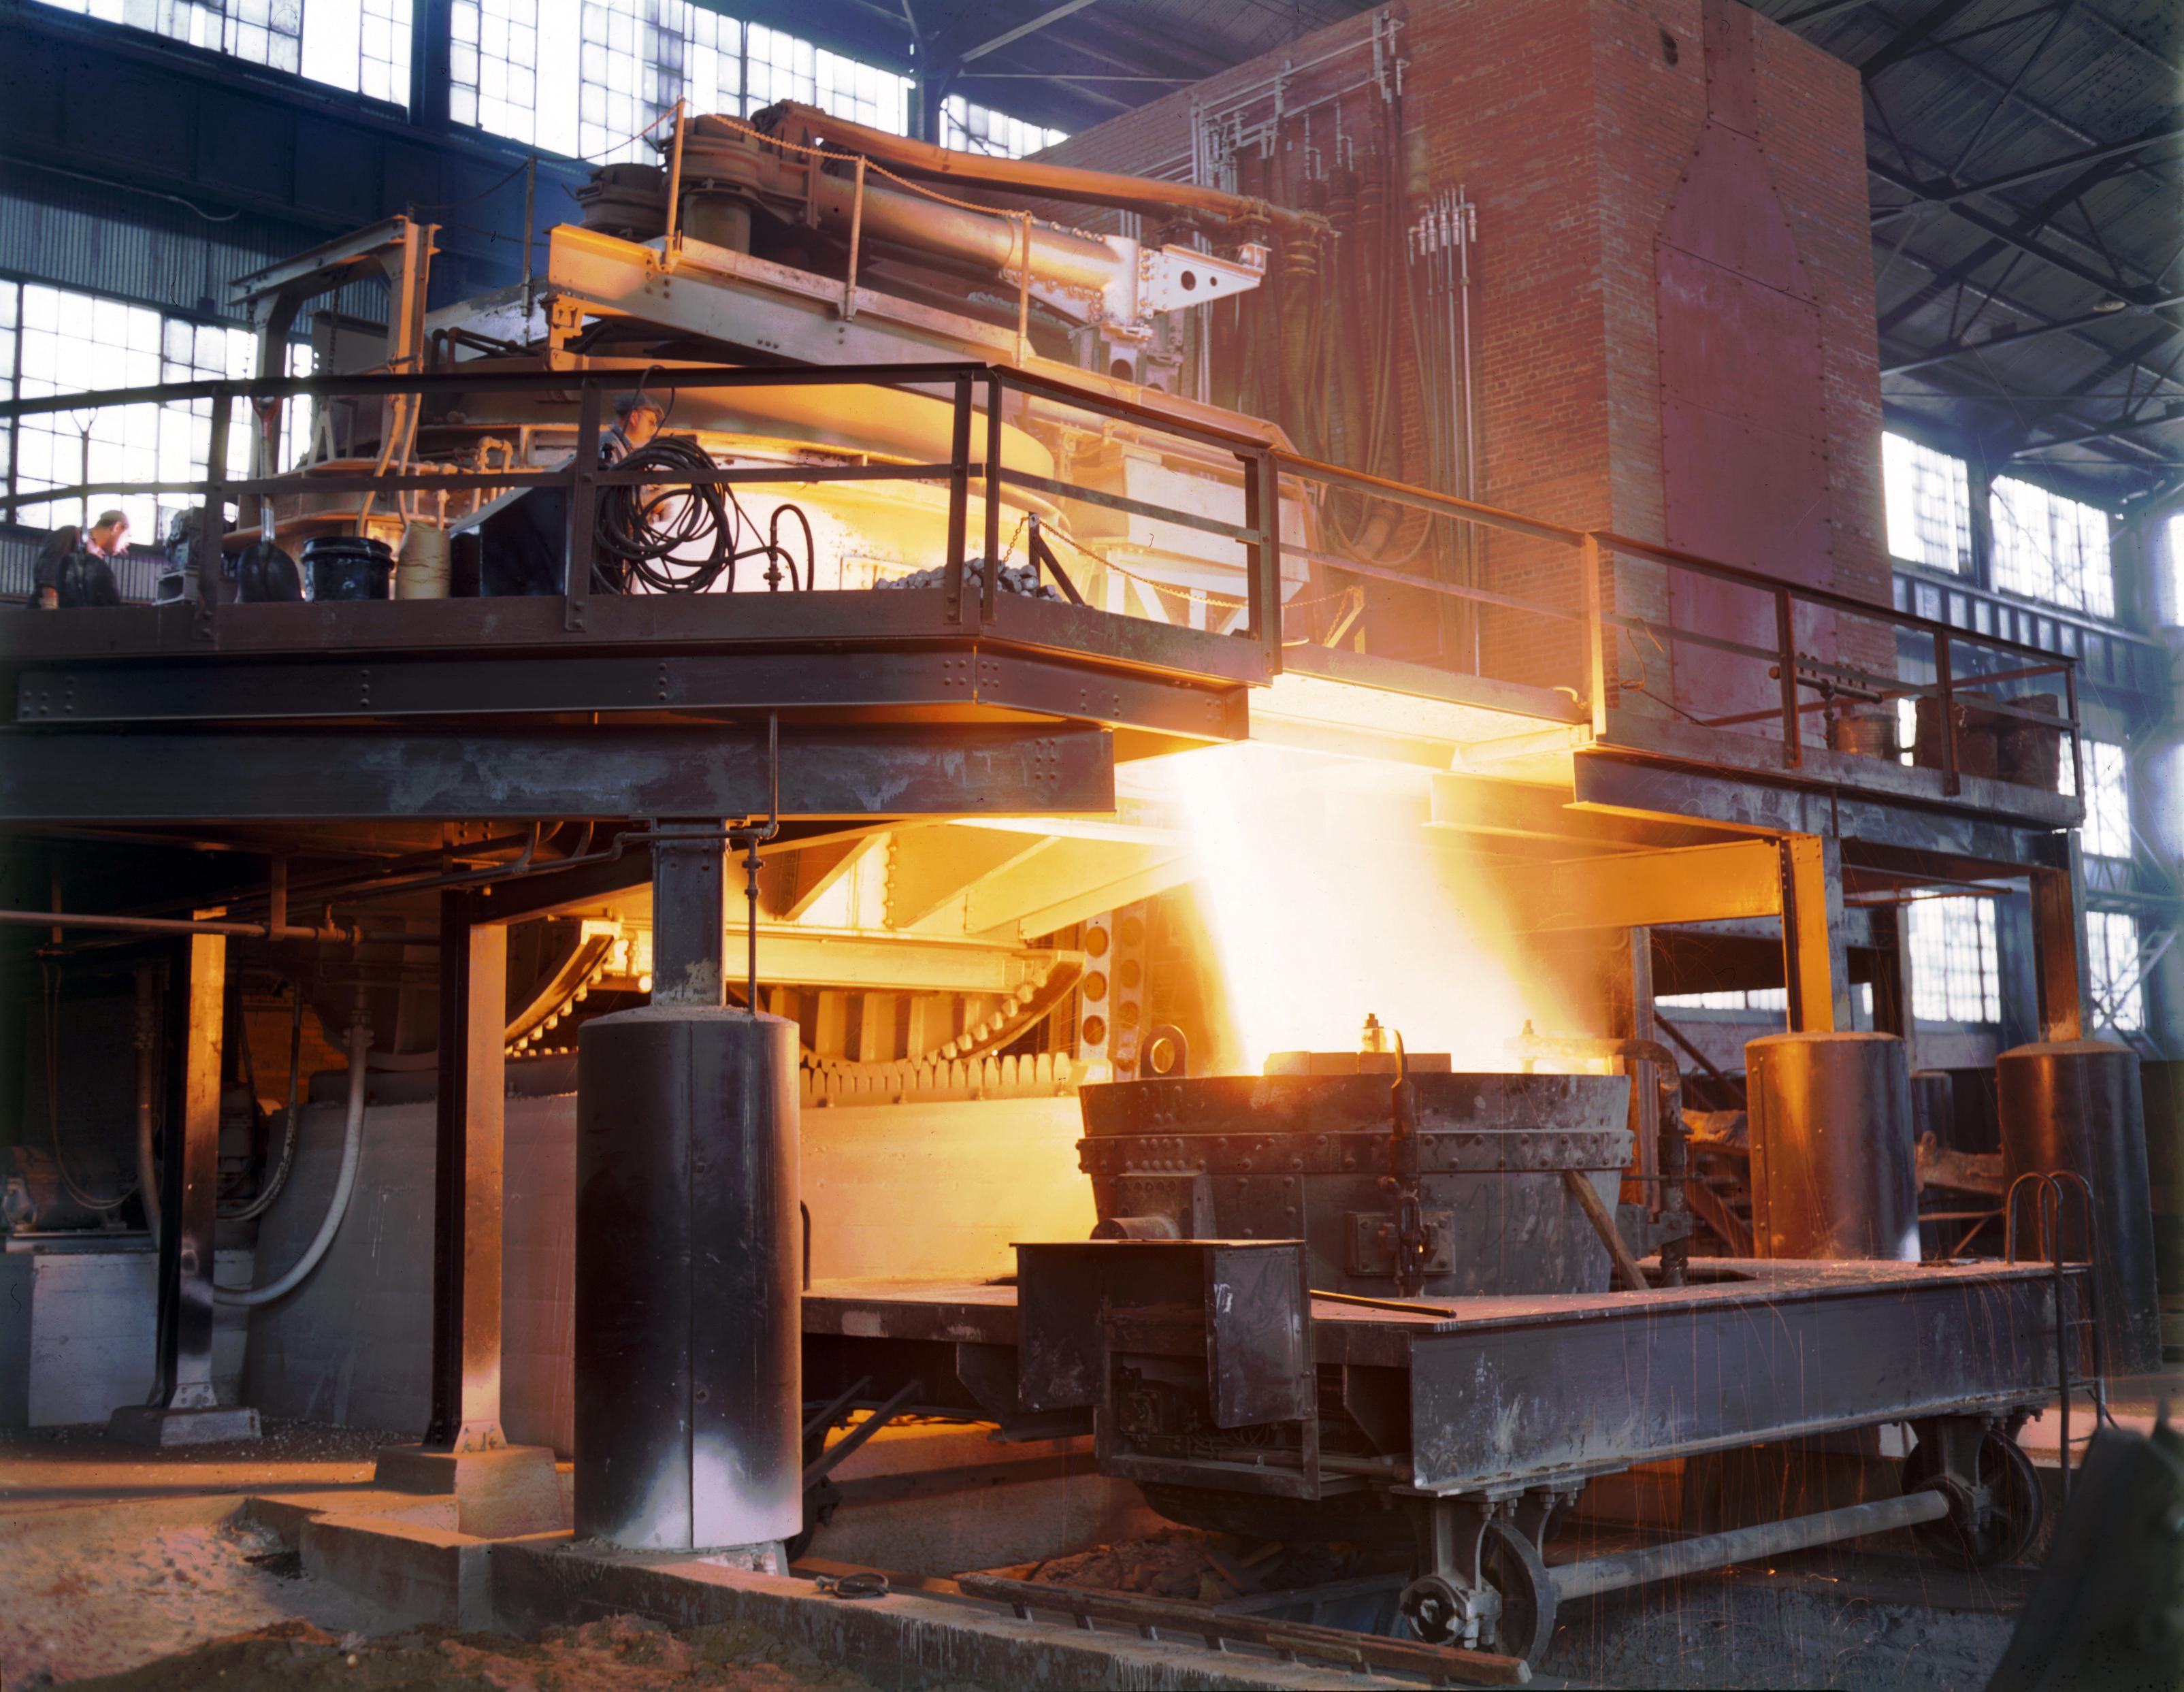 File:Allegheny Ludlum steel furnace.jpg